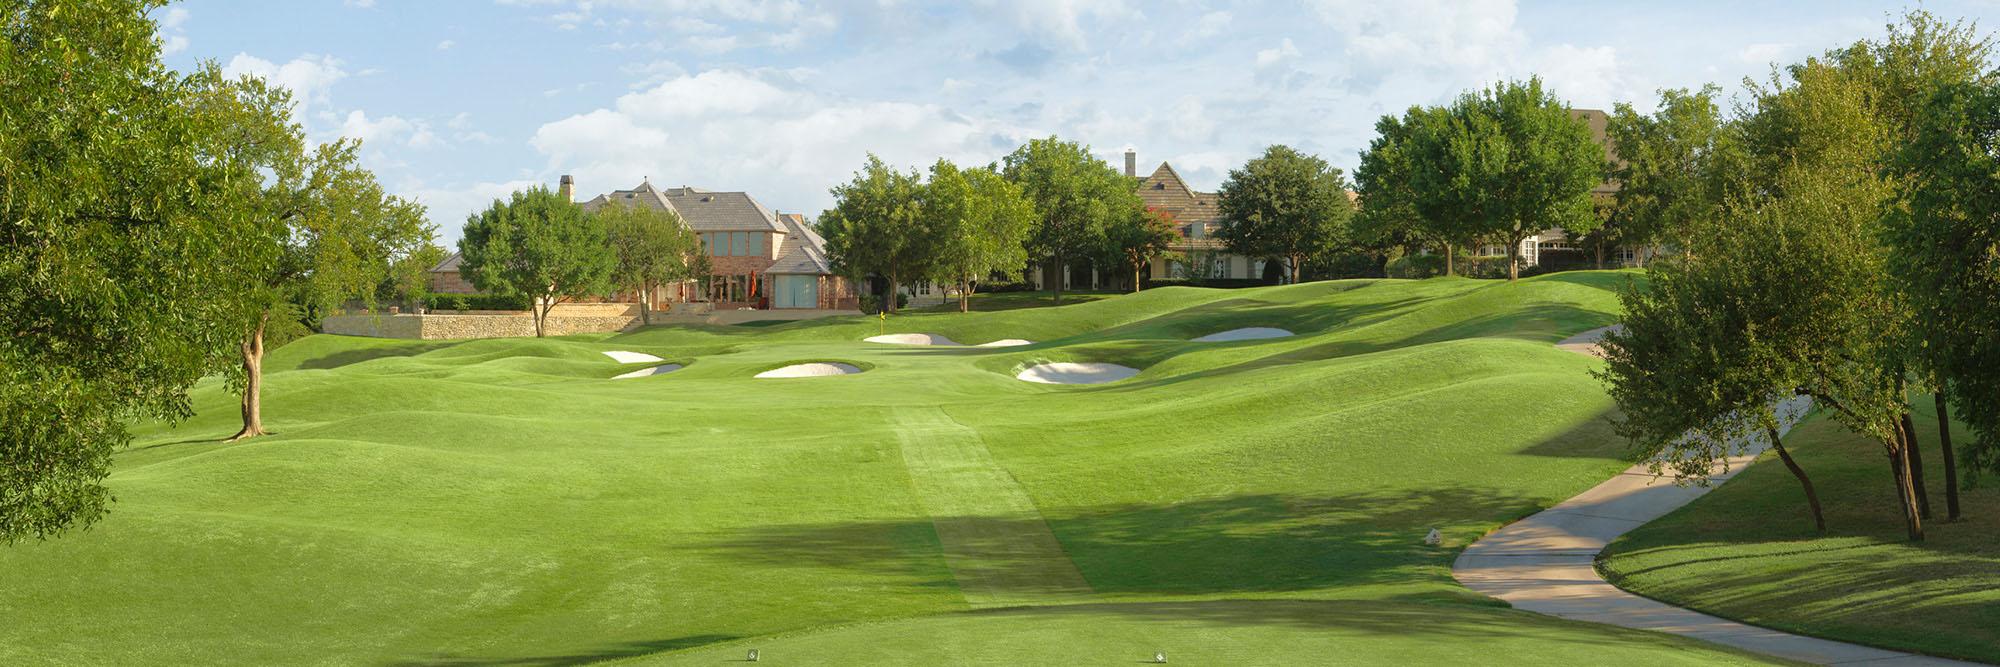 Golf Course Image - Mira Vista No. 12